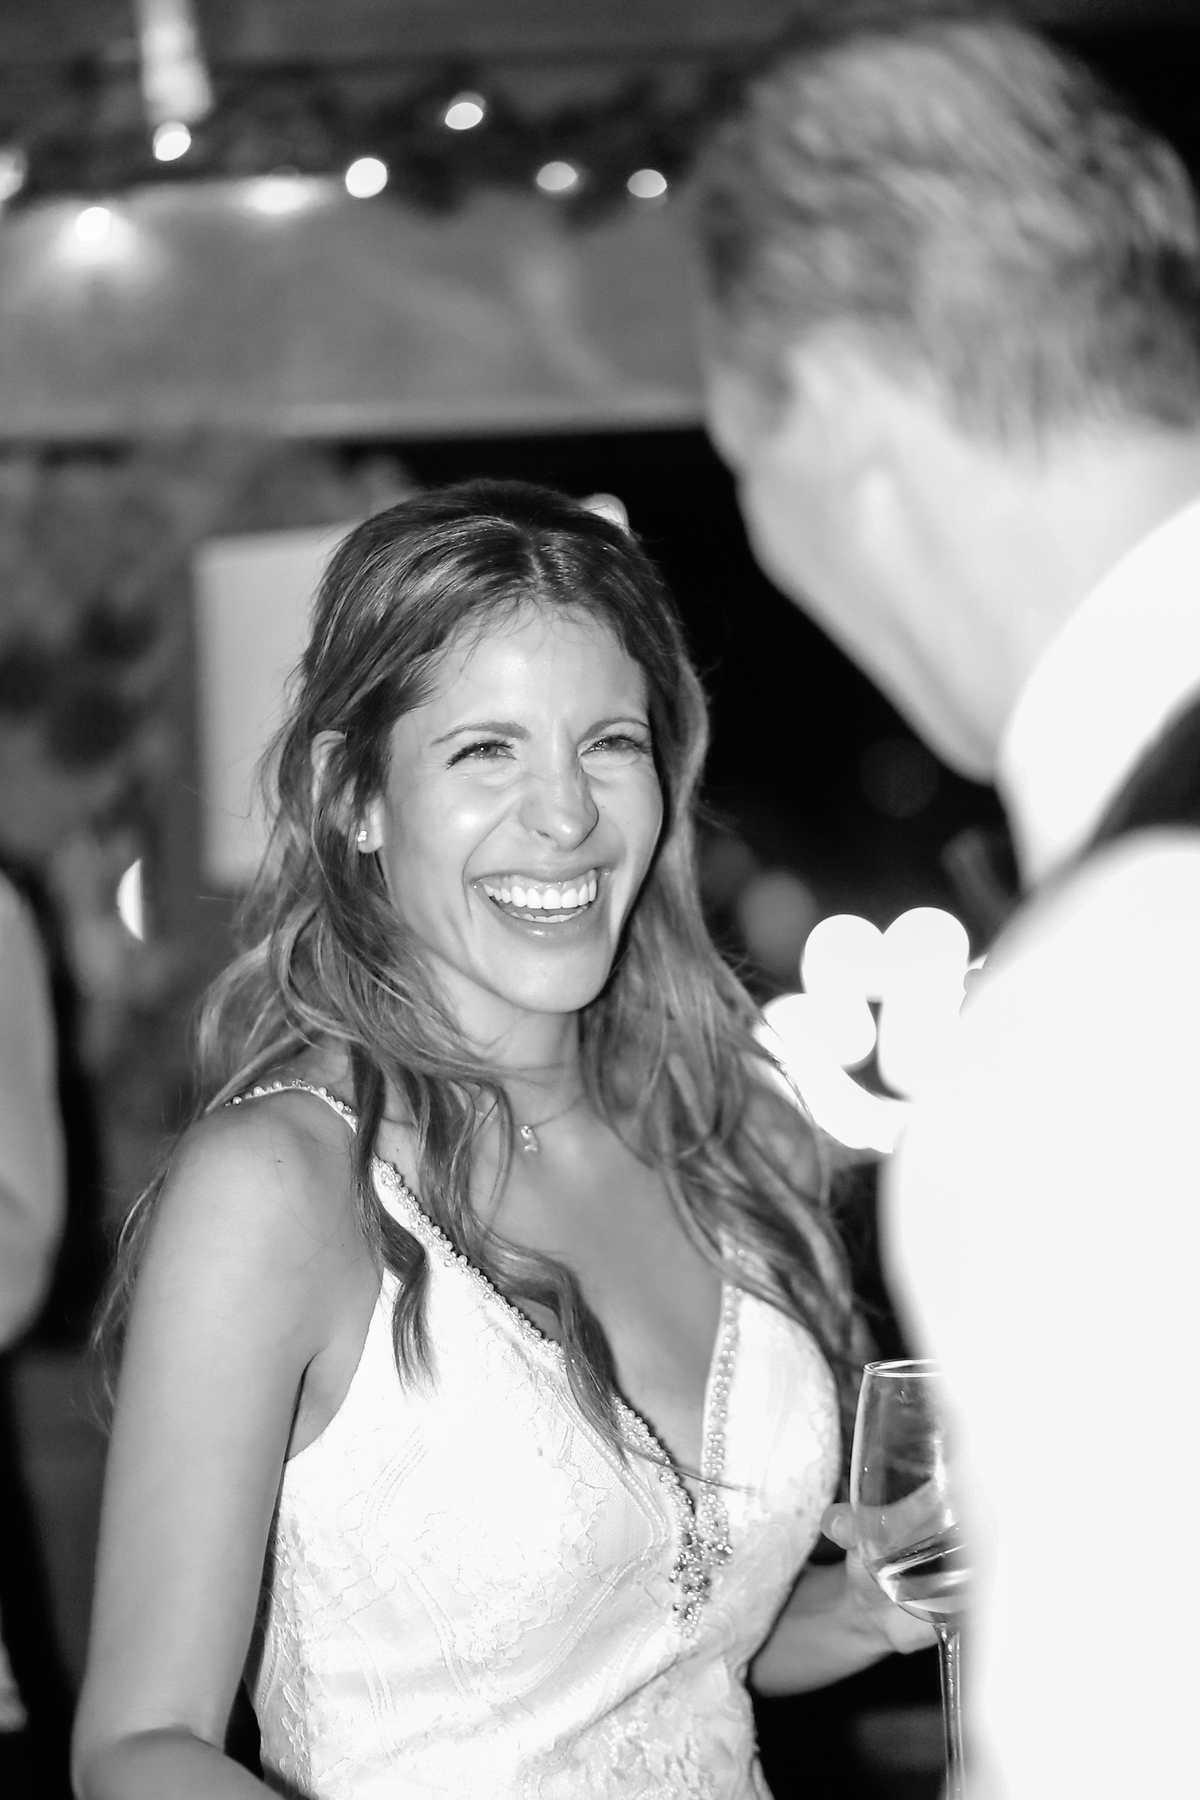 Our gorgeous bride Danielle